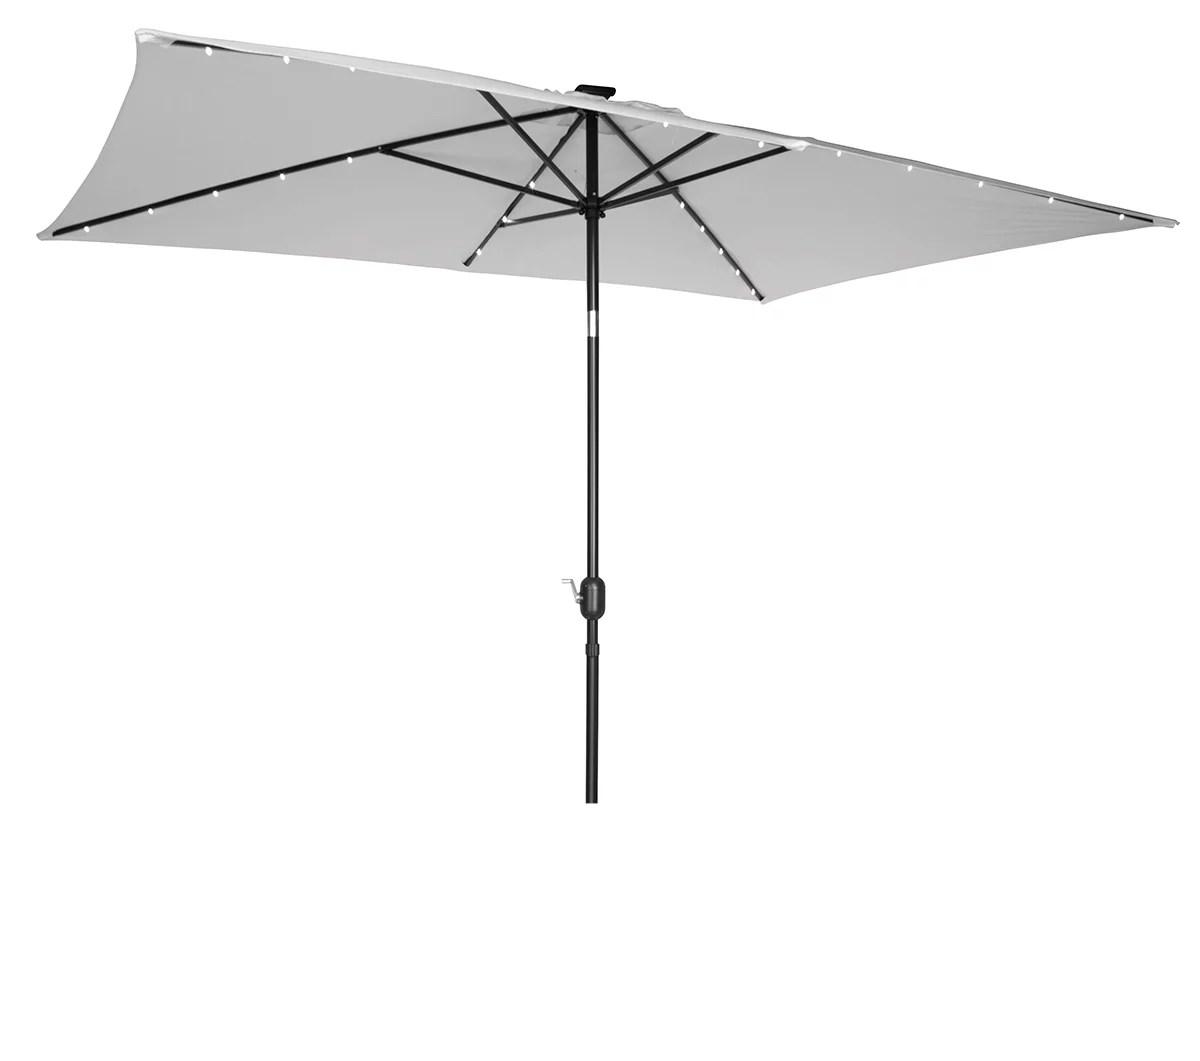 rectangular solar powered led lighted patio umbrella 10 x 6 5 by trademark innovations gray